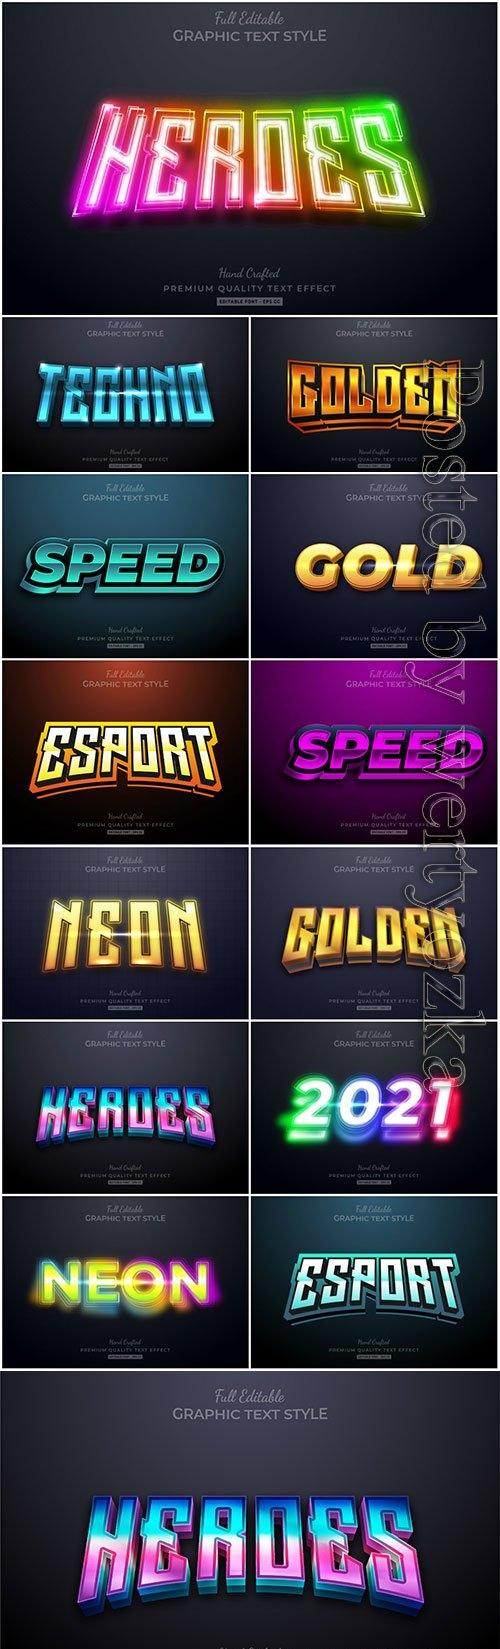 Vector premium text effect